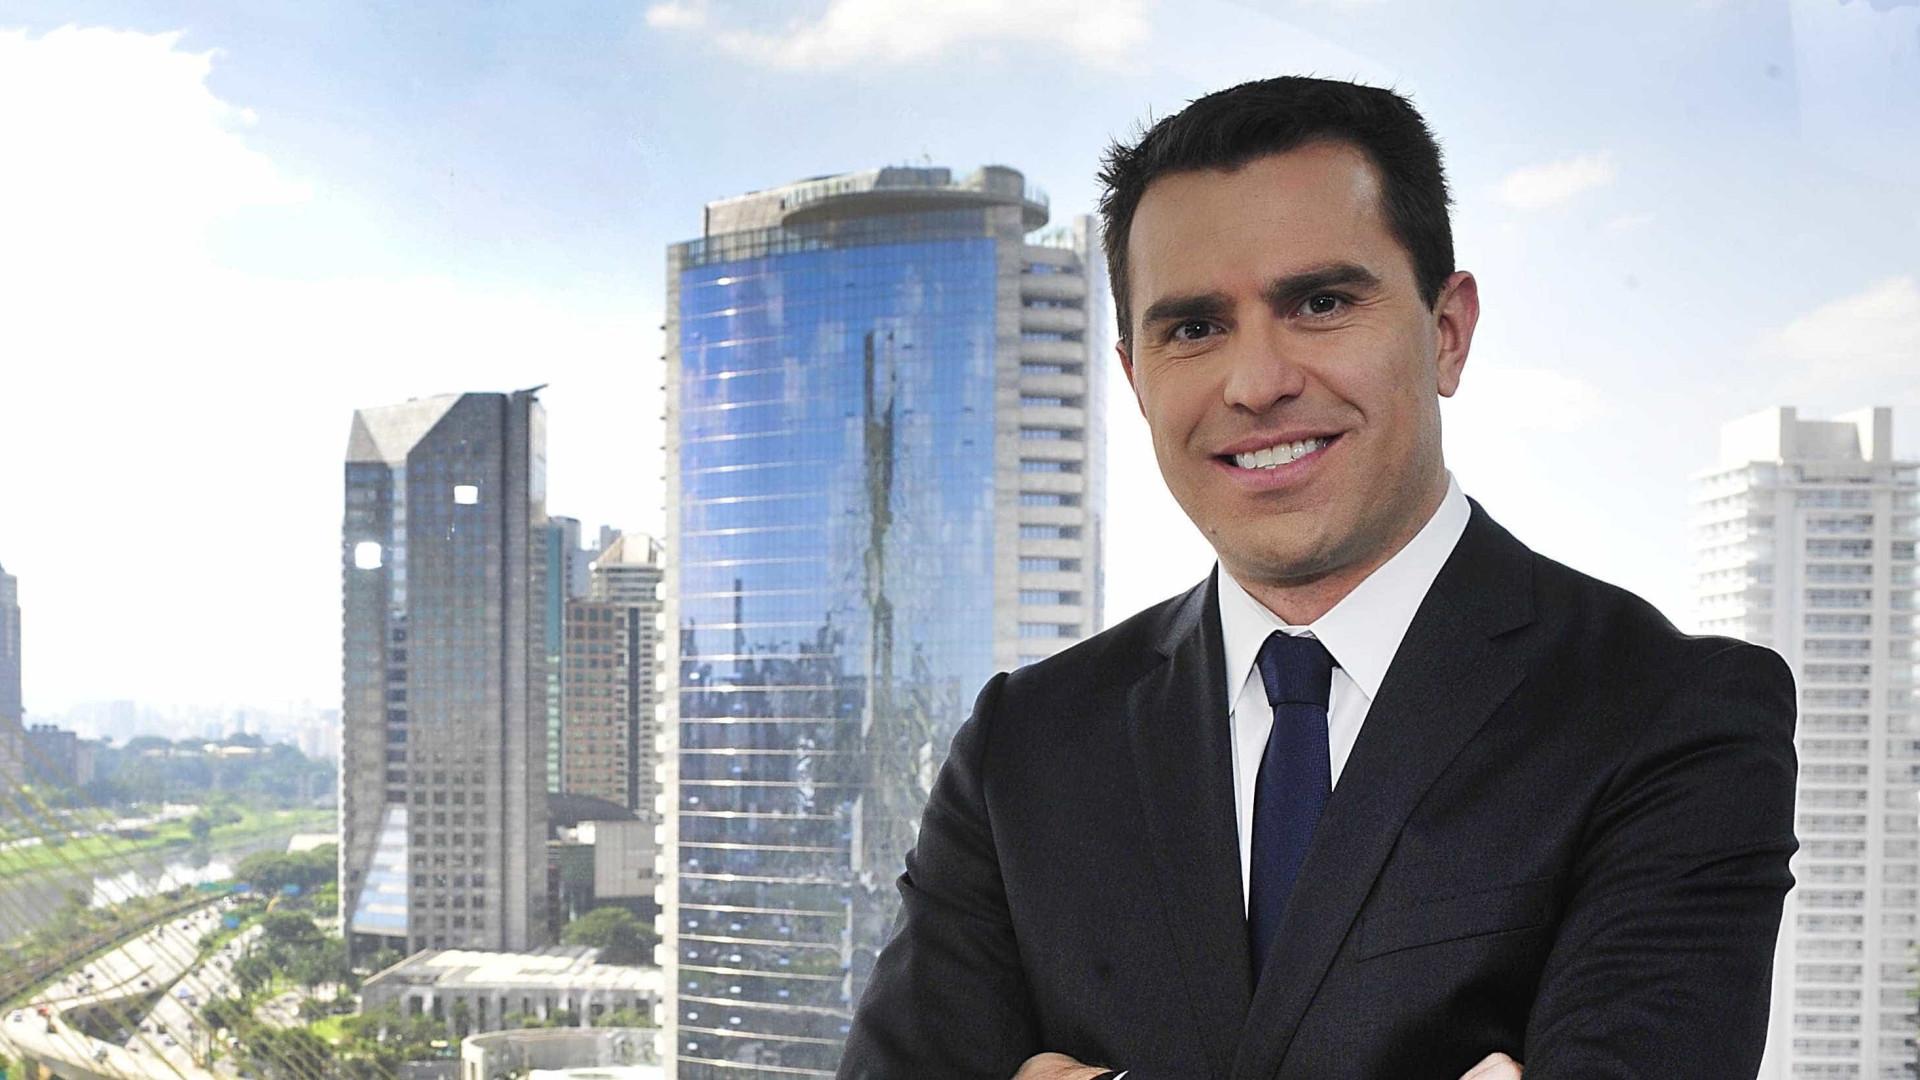 Suposto vídeo íntimo de Bocardi vaza; jornalista contata advogados